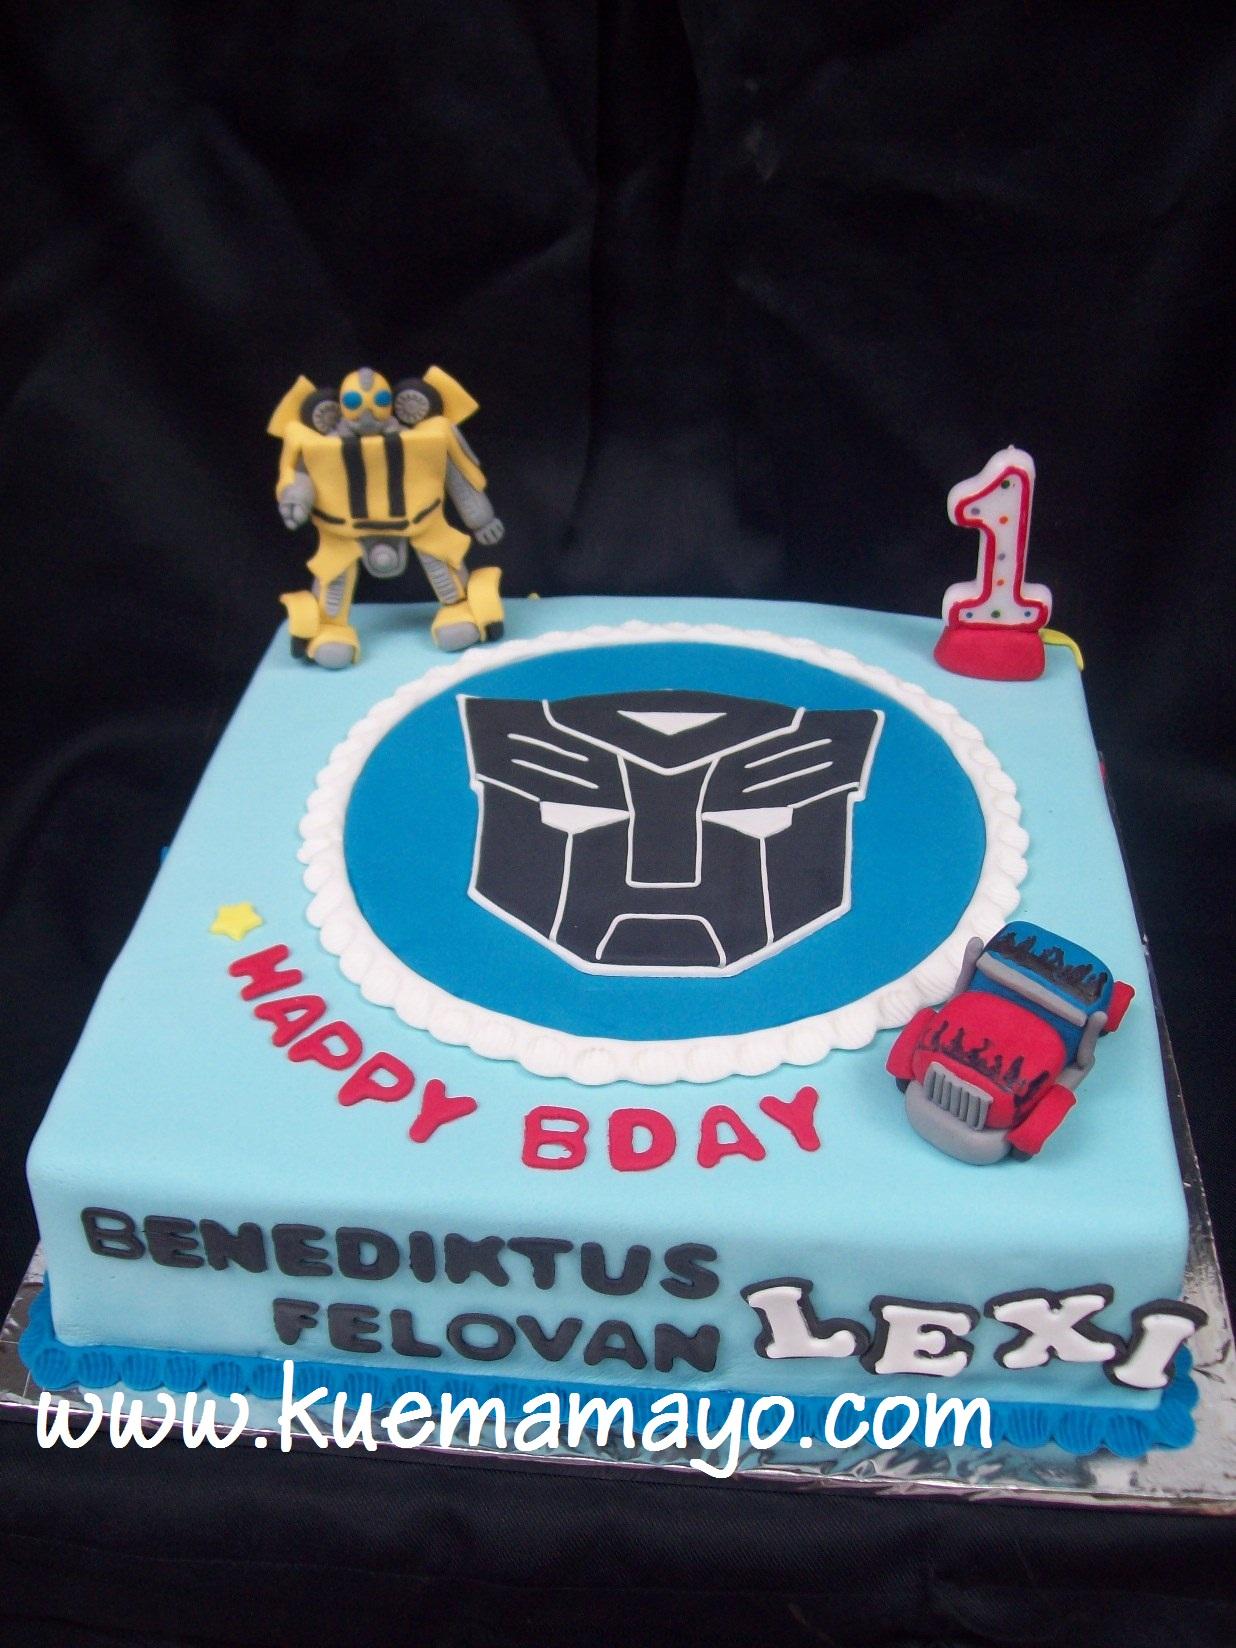 Transformer Cake Benediktus Lexi Felovan Mamayo